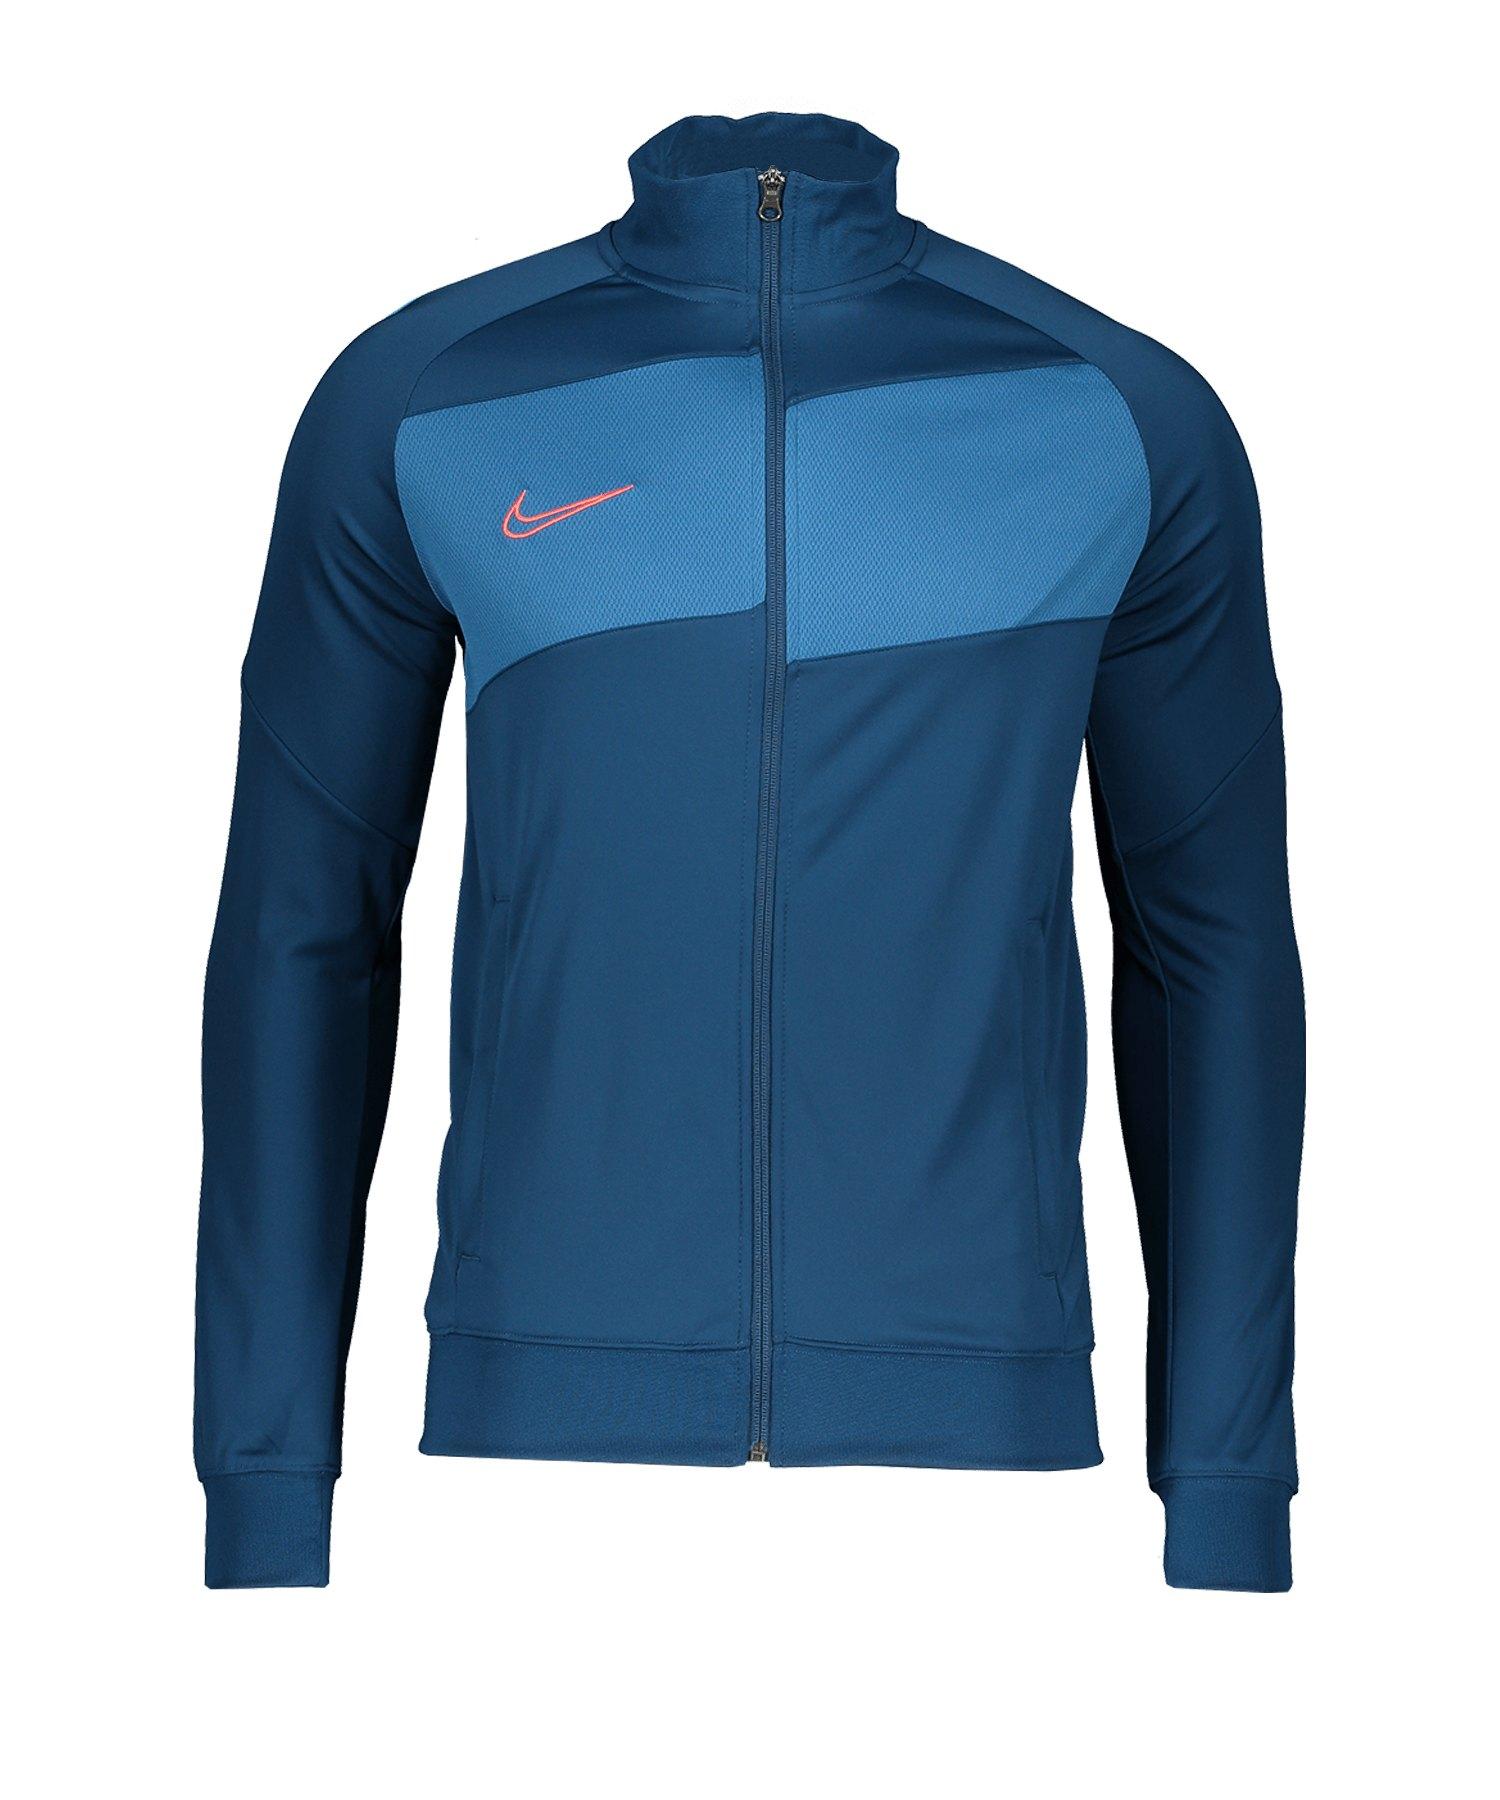 Nike Academy Pro Trainingsjacke Blau F457 - blau